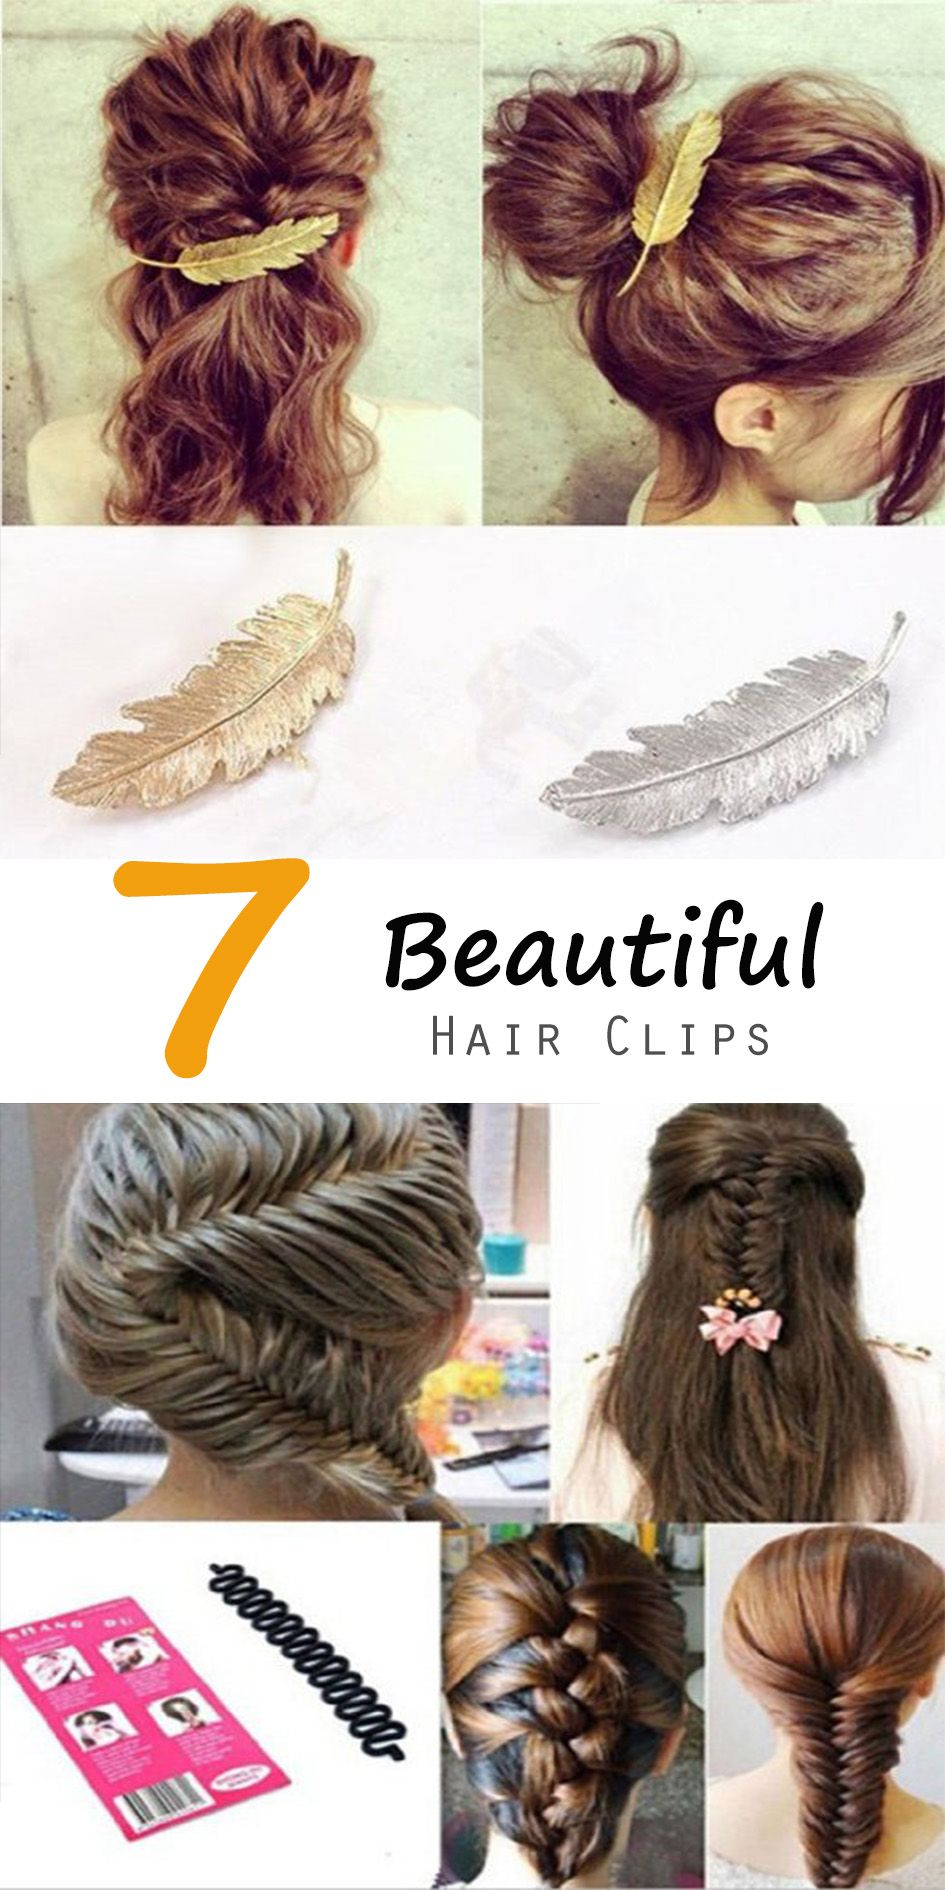 7 Beautiful Hair Clips | oh so sexy hair | Pinterest | Hair style ...